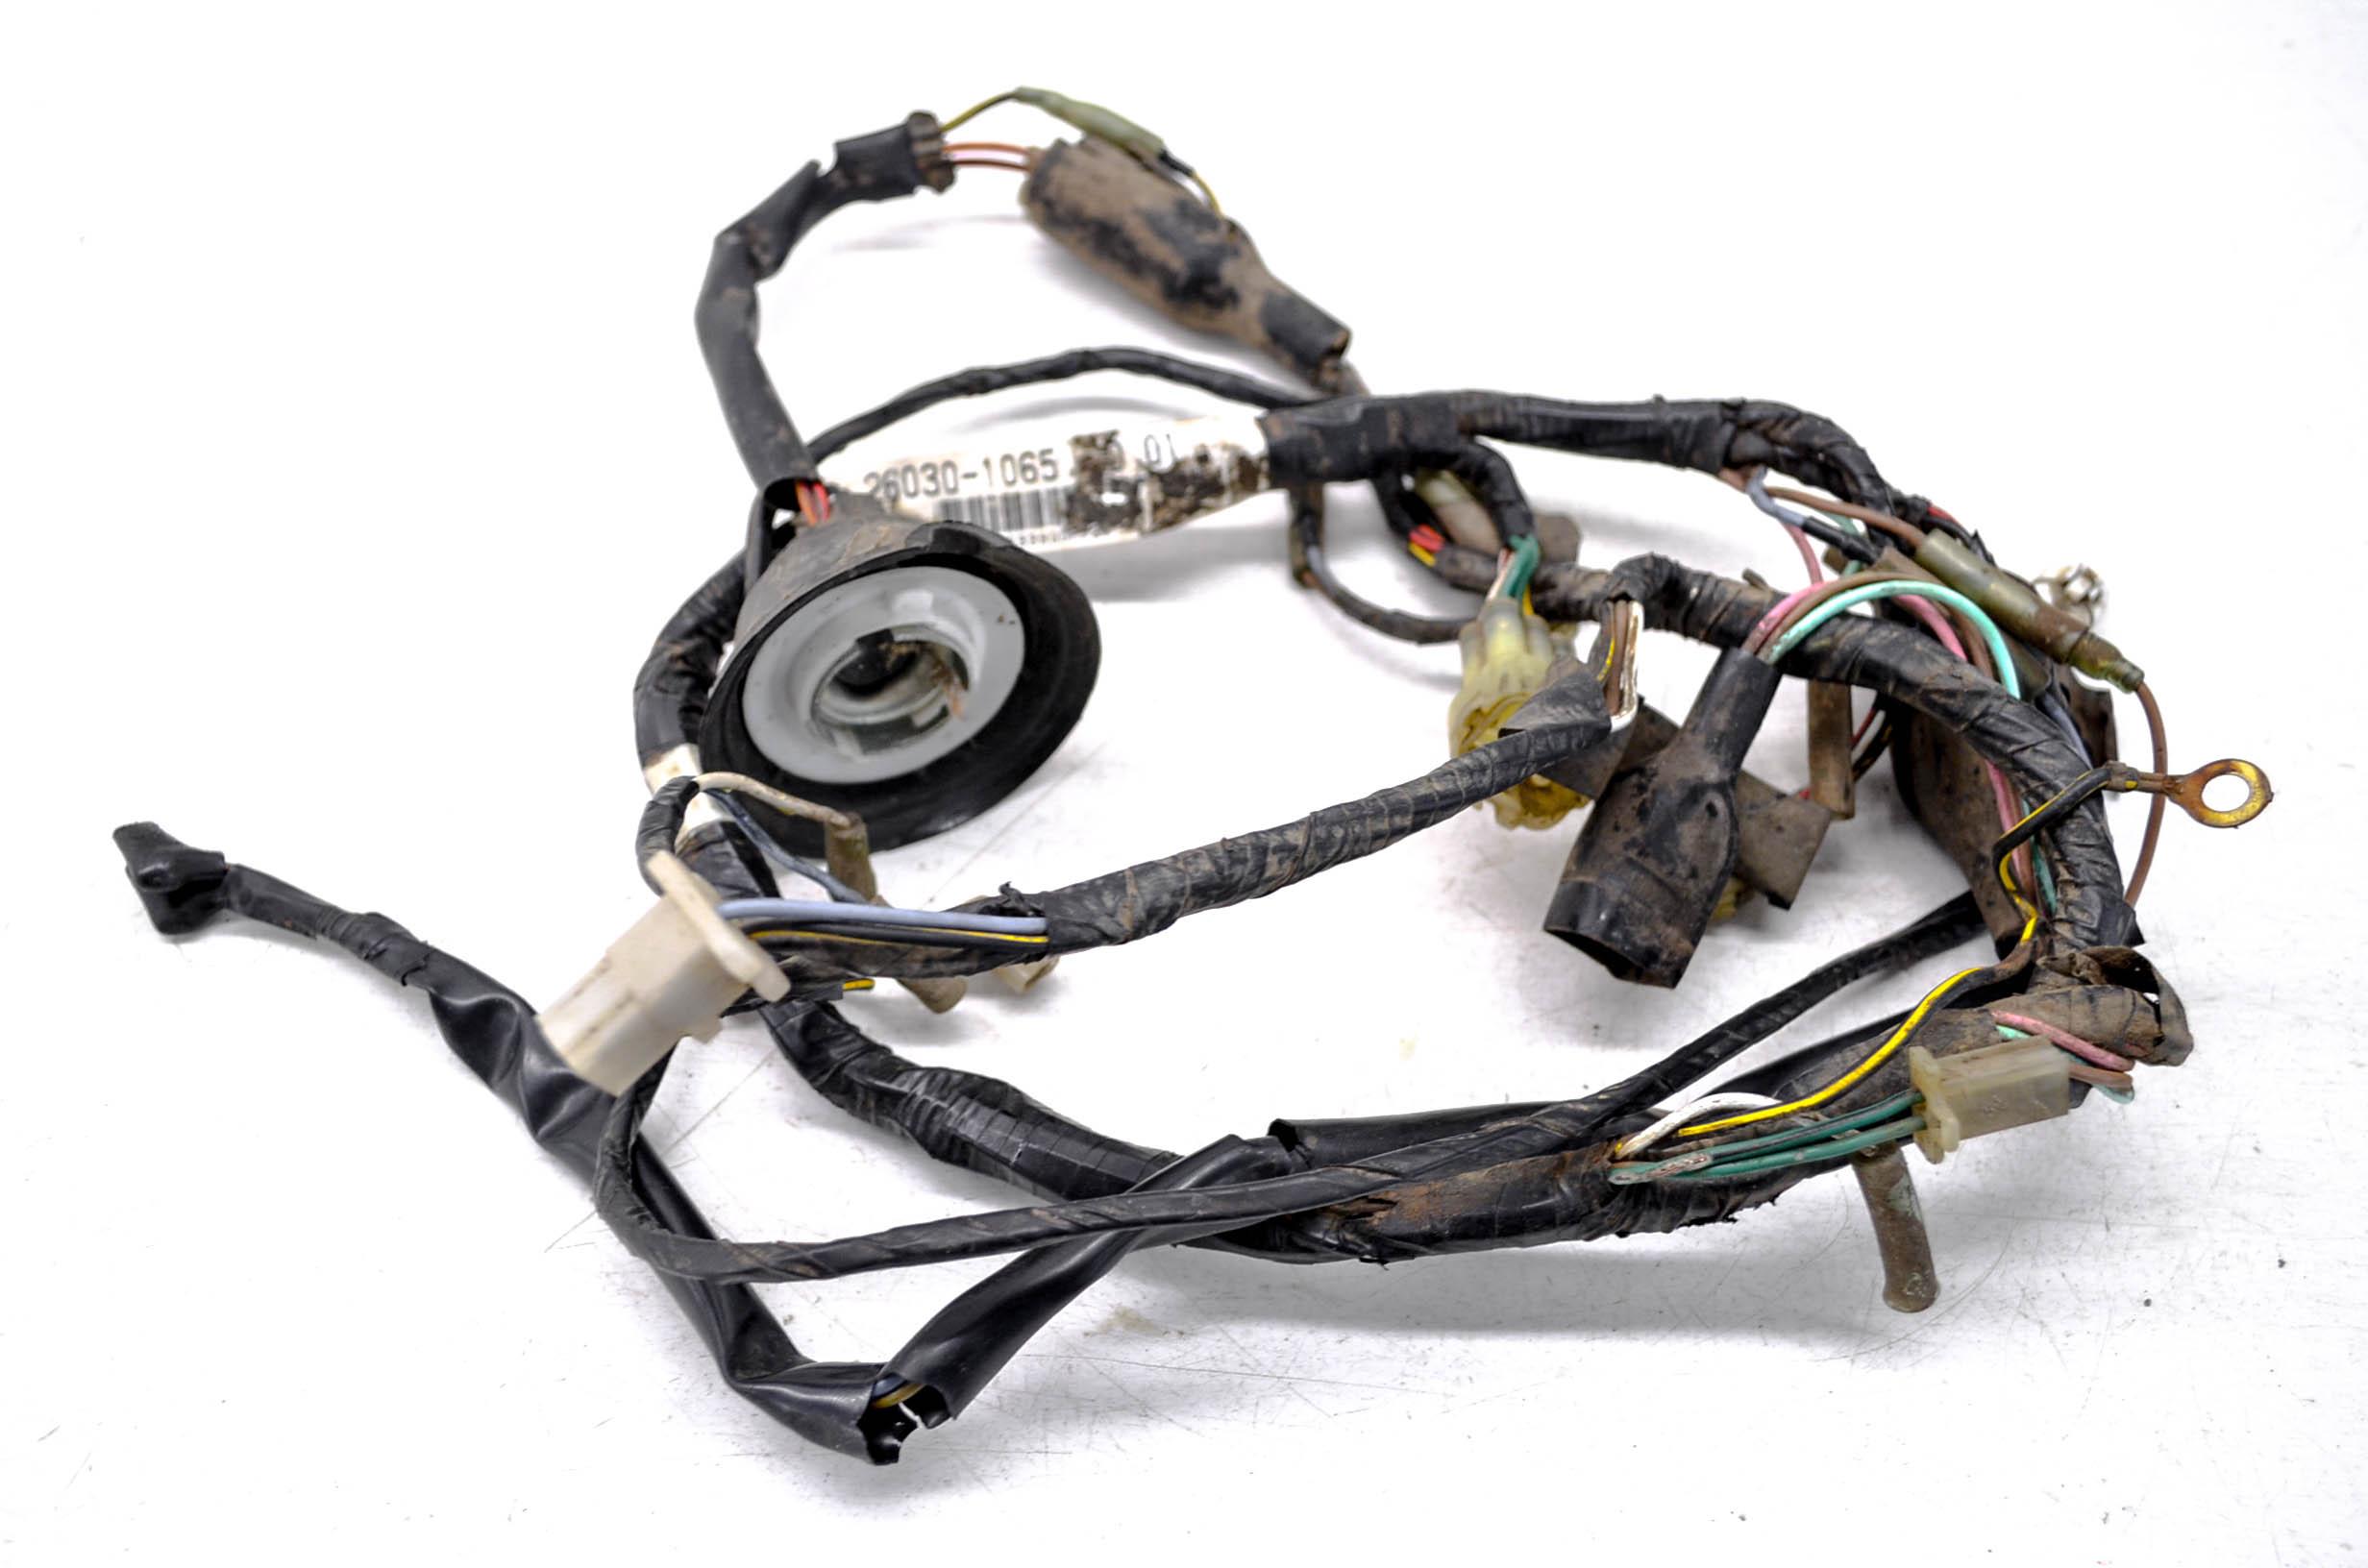 01 kawasaki mojave 250 2x4 wire harness electrical wiring ksf250